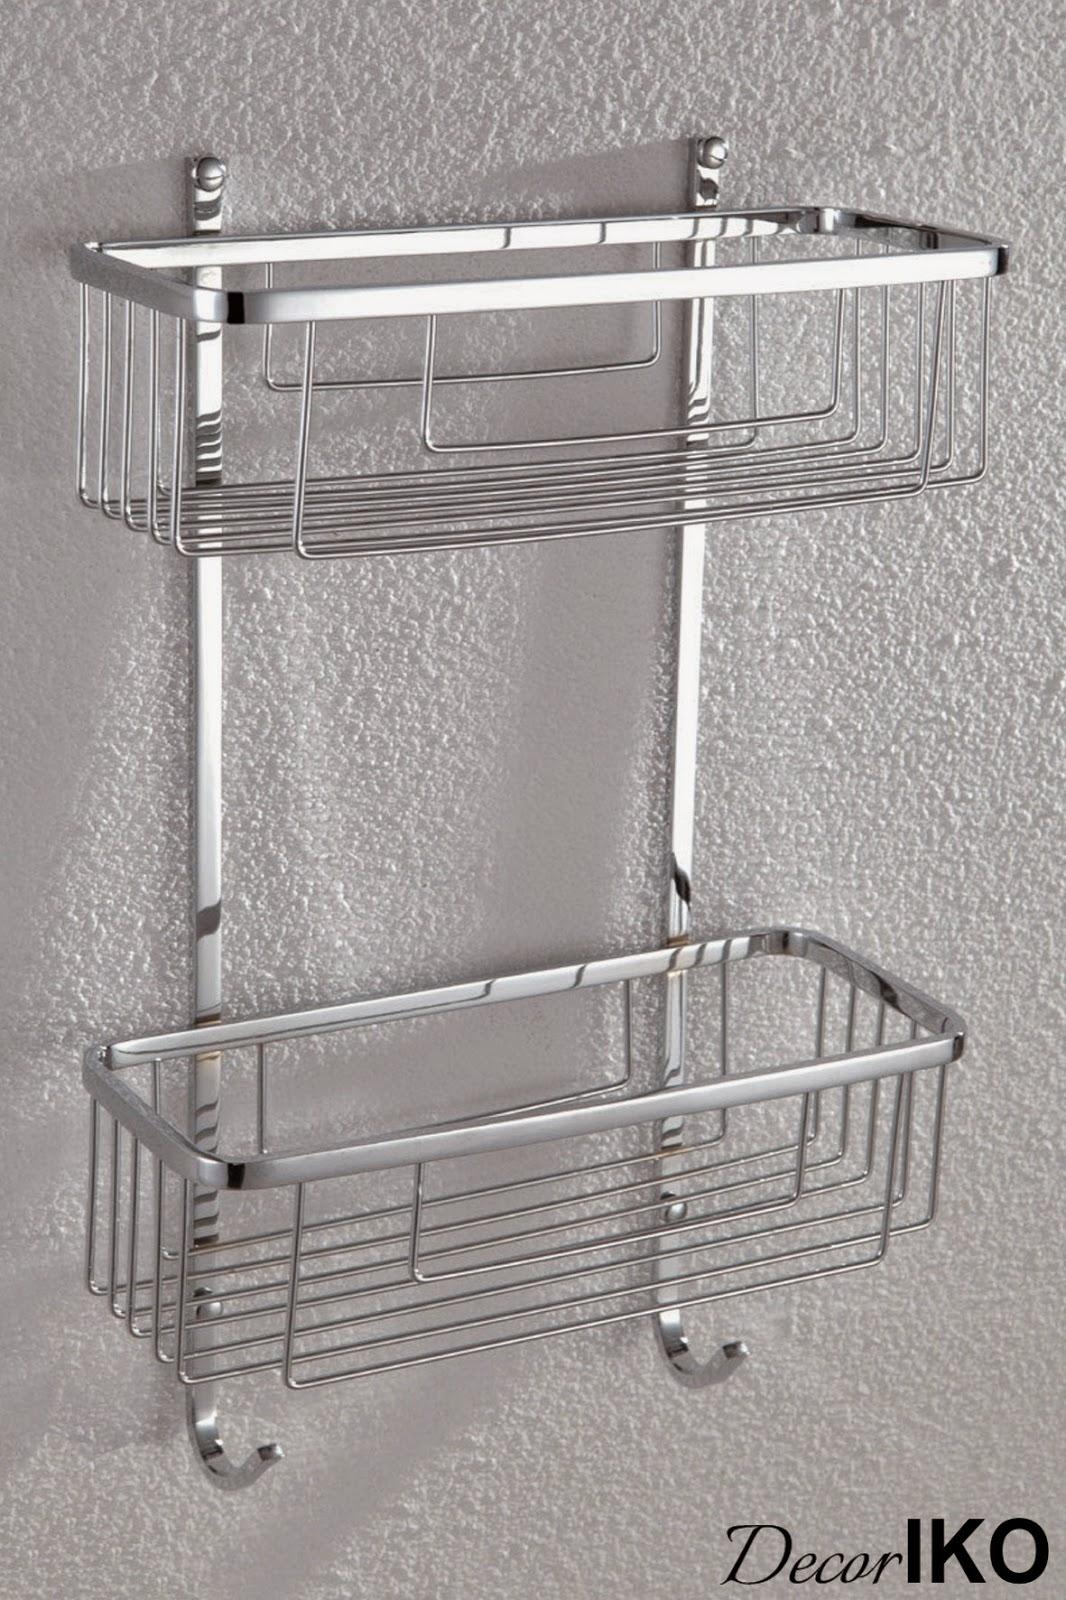 http://decoriko.ru/magazin/product/metall_shelf_8014